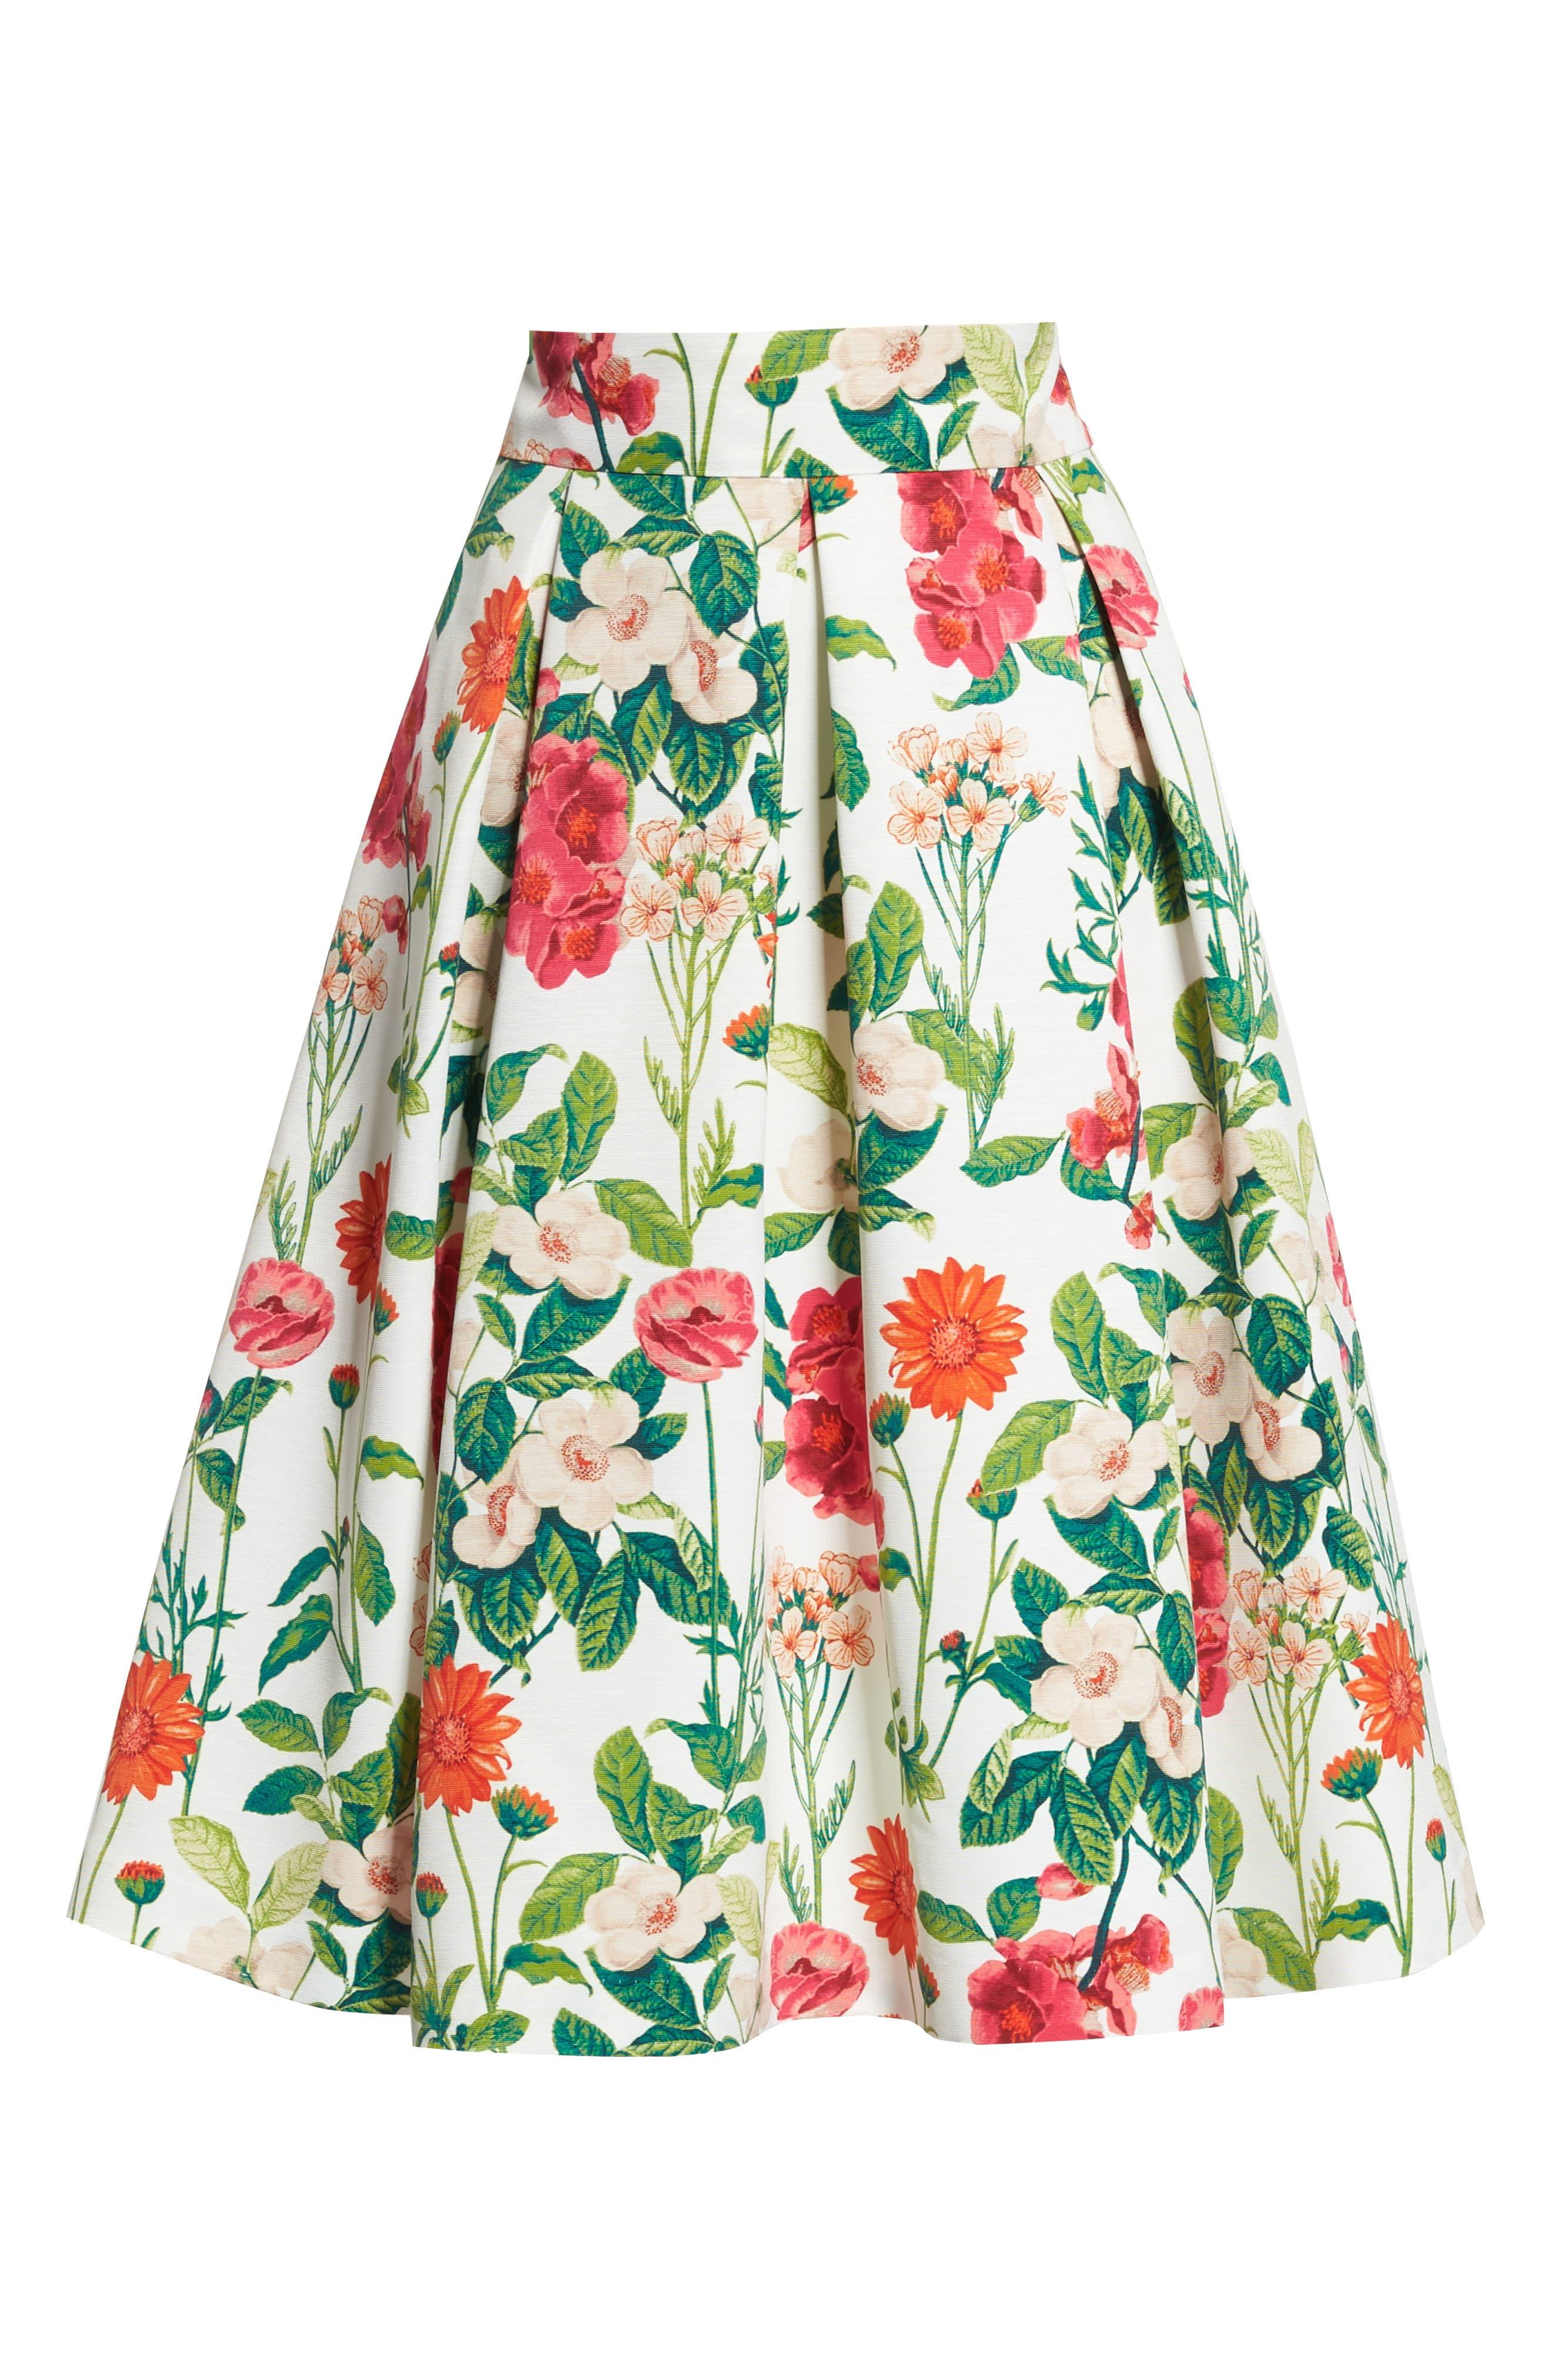 Floral A-Line Skirt,                             Alternate thumbnail 6, color,                             901